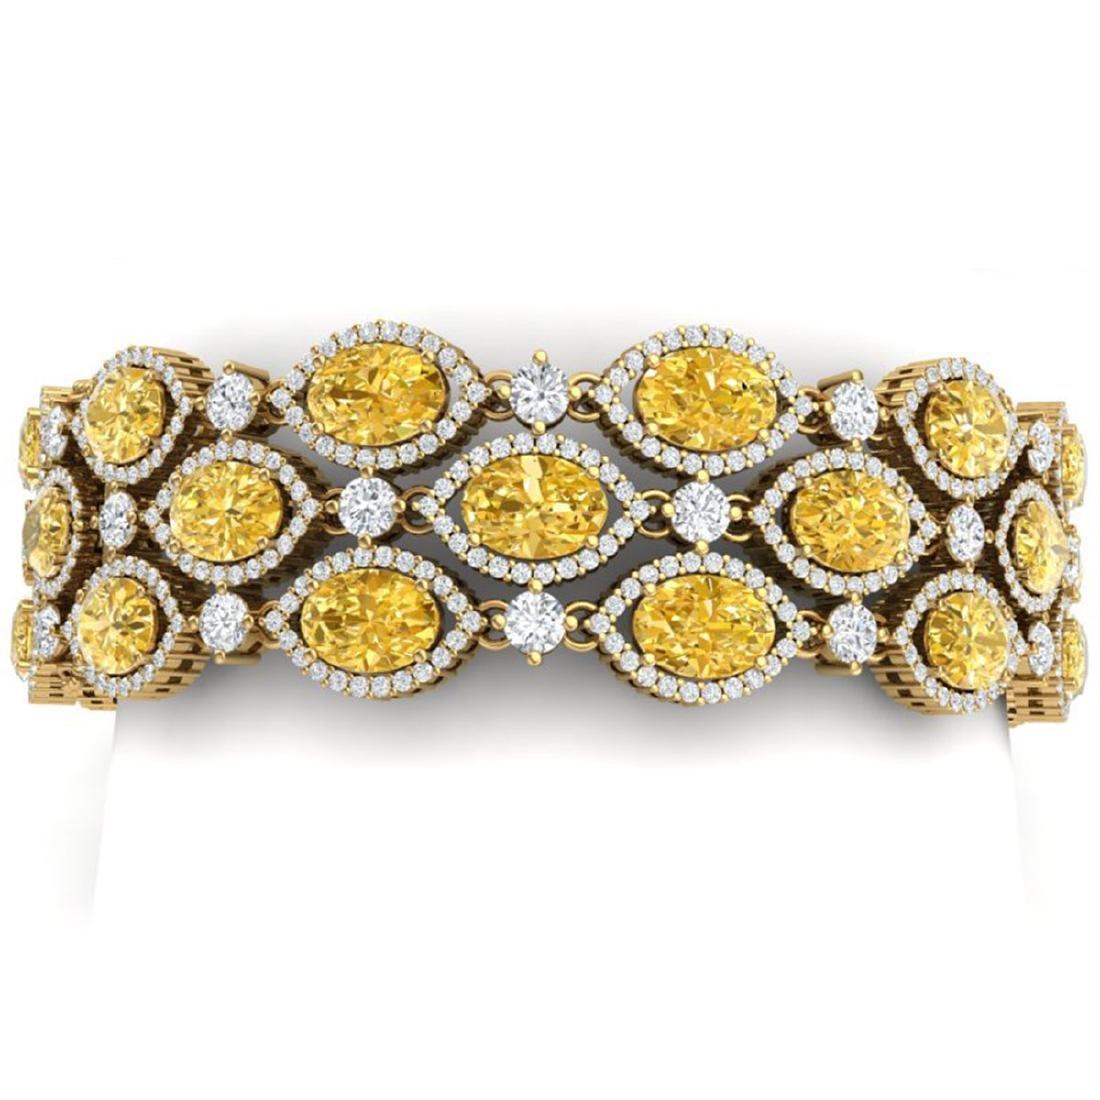 43.84 CTW Canary Citrine & VS Diamond Bracelet 18K Gold